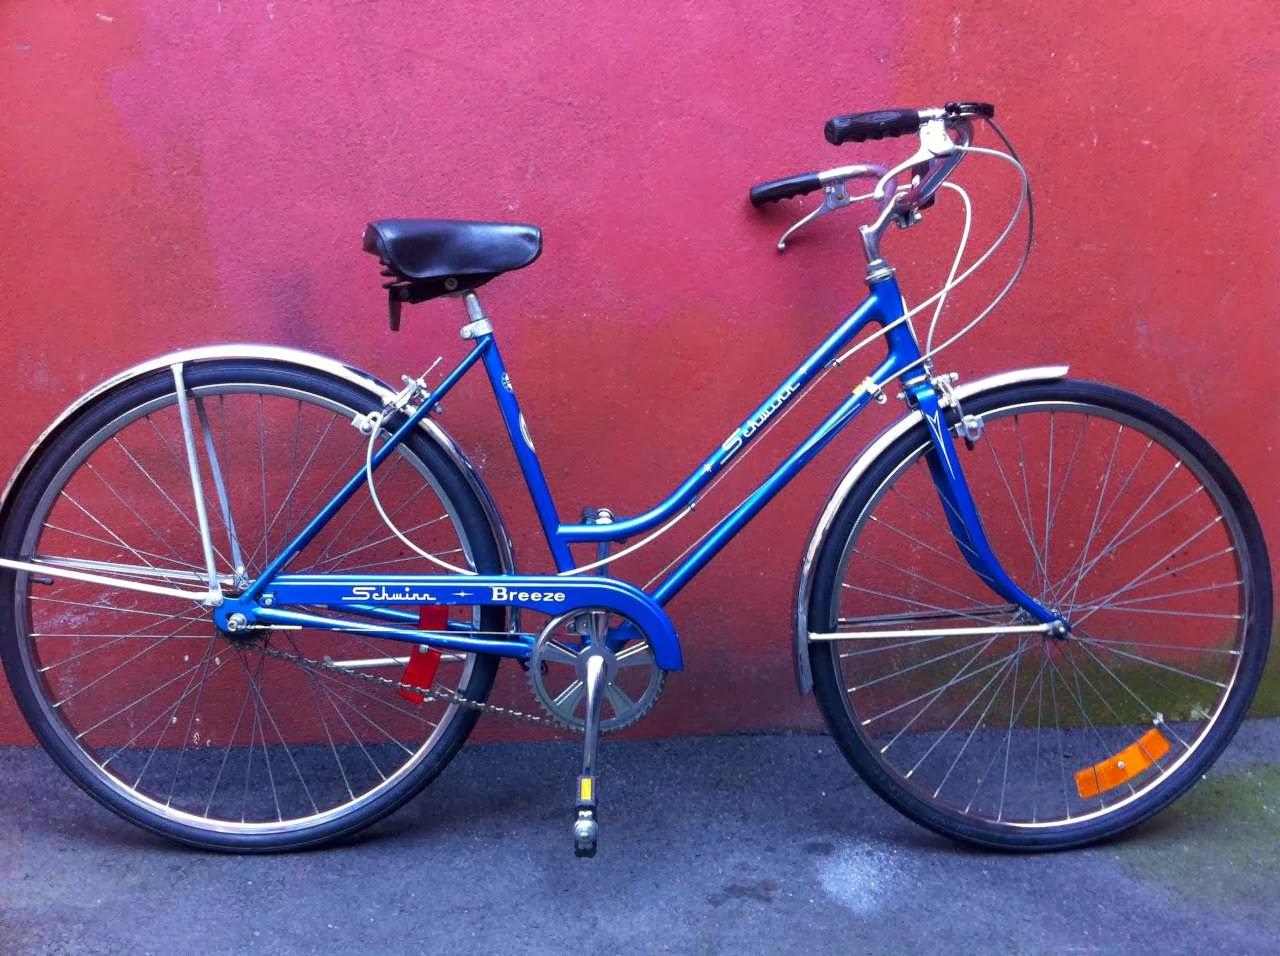 Bike Boom Refurbished Bikes Schwinn Breeze Cruiser 3